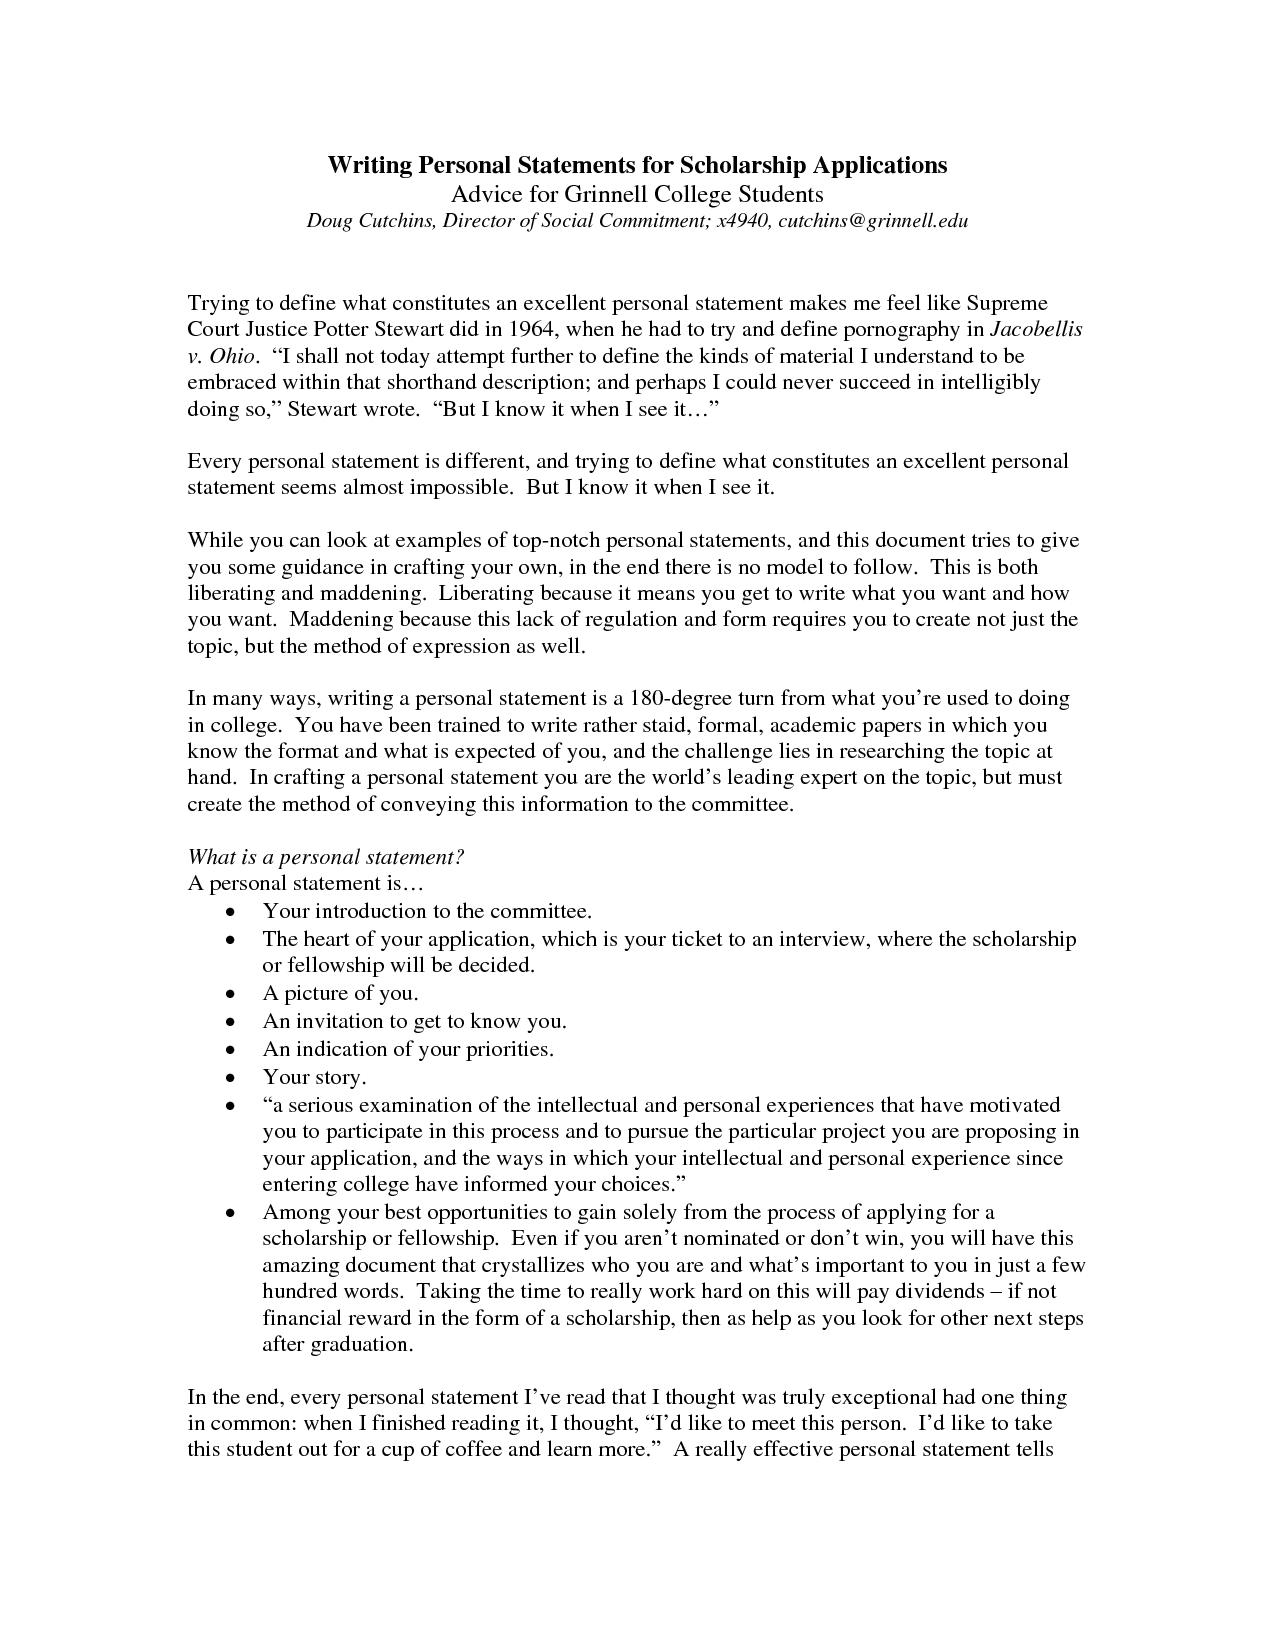 essay scholarships 2015